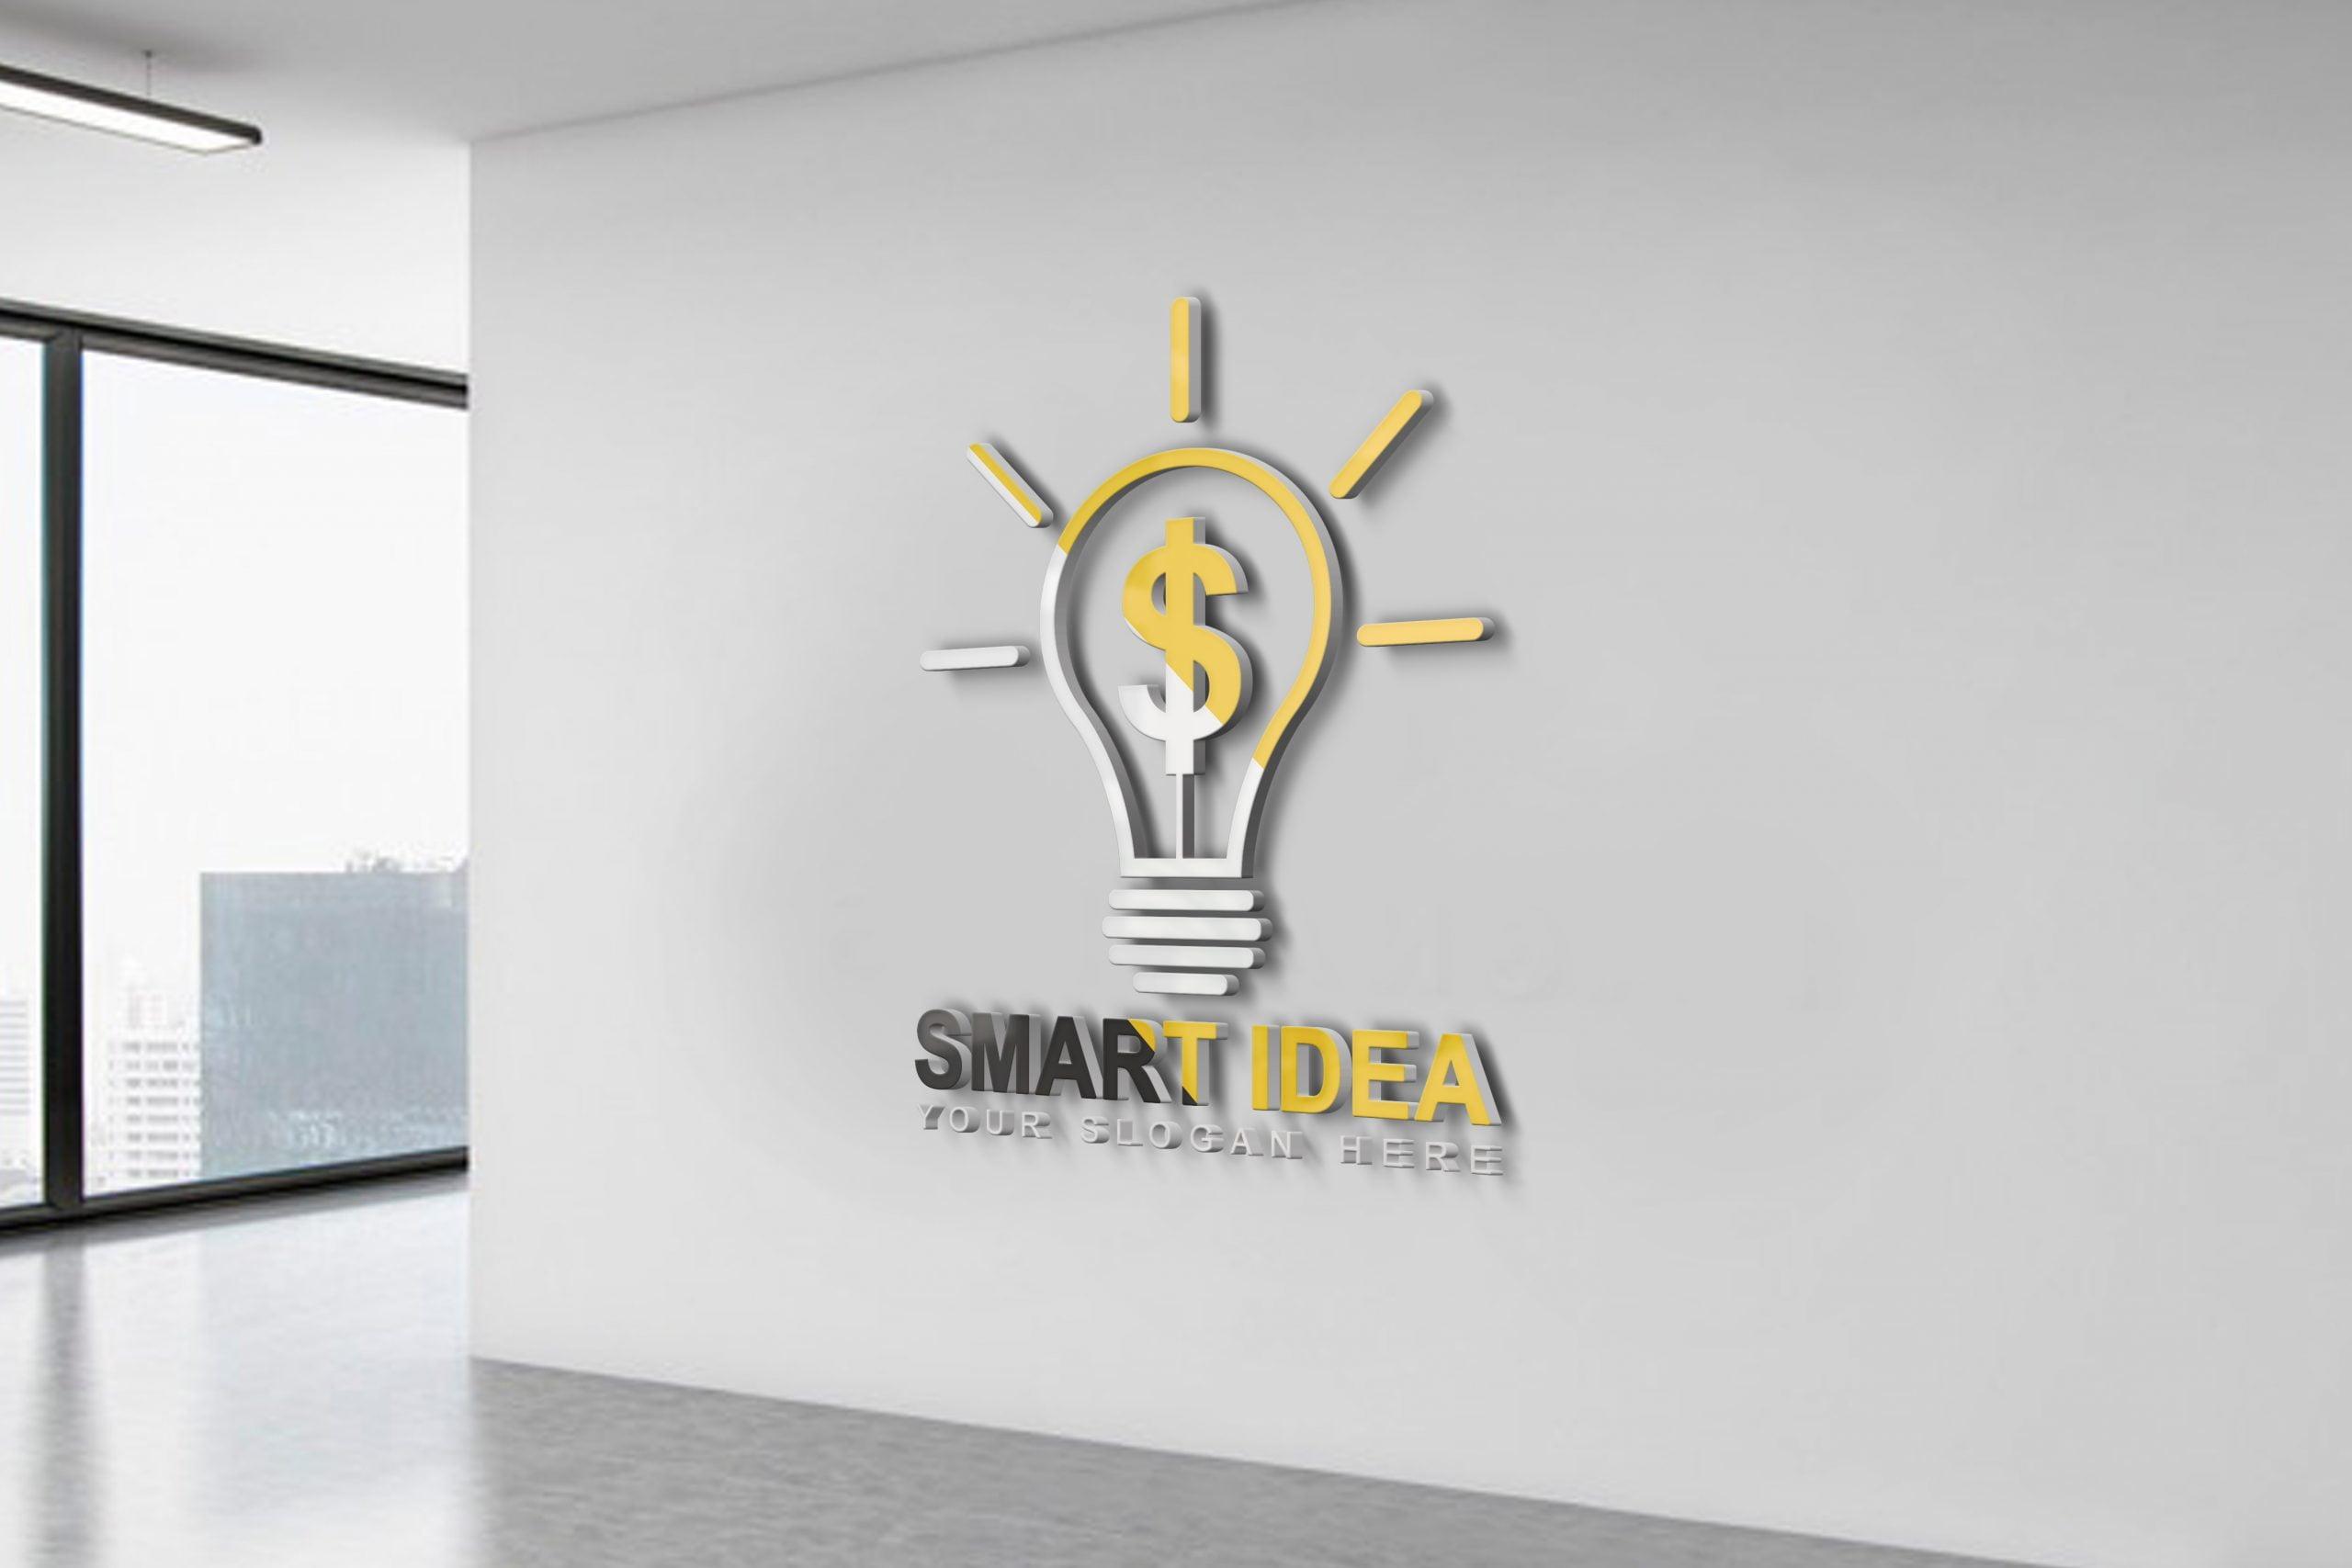 Smart Idea Logo Design Office wall